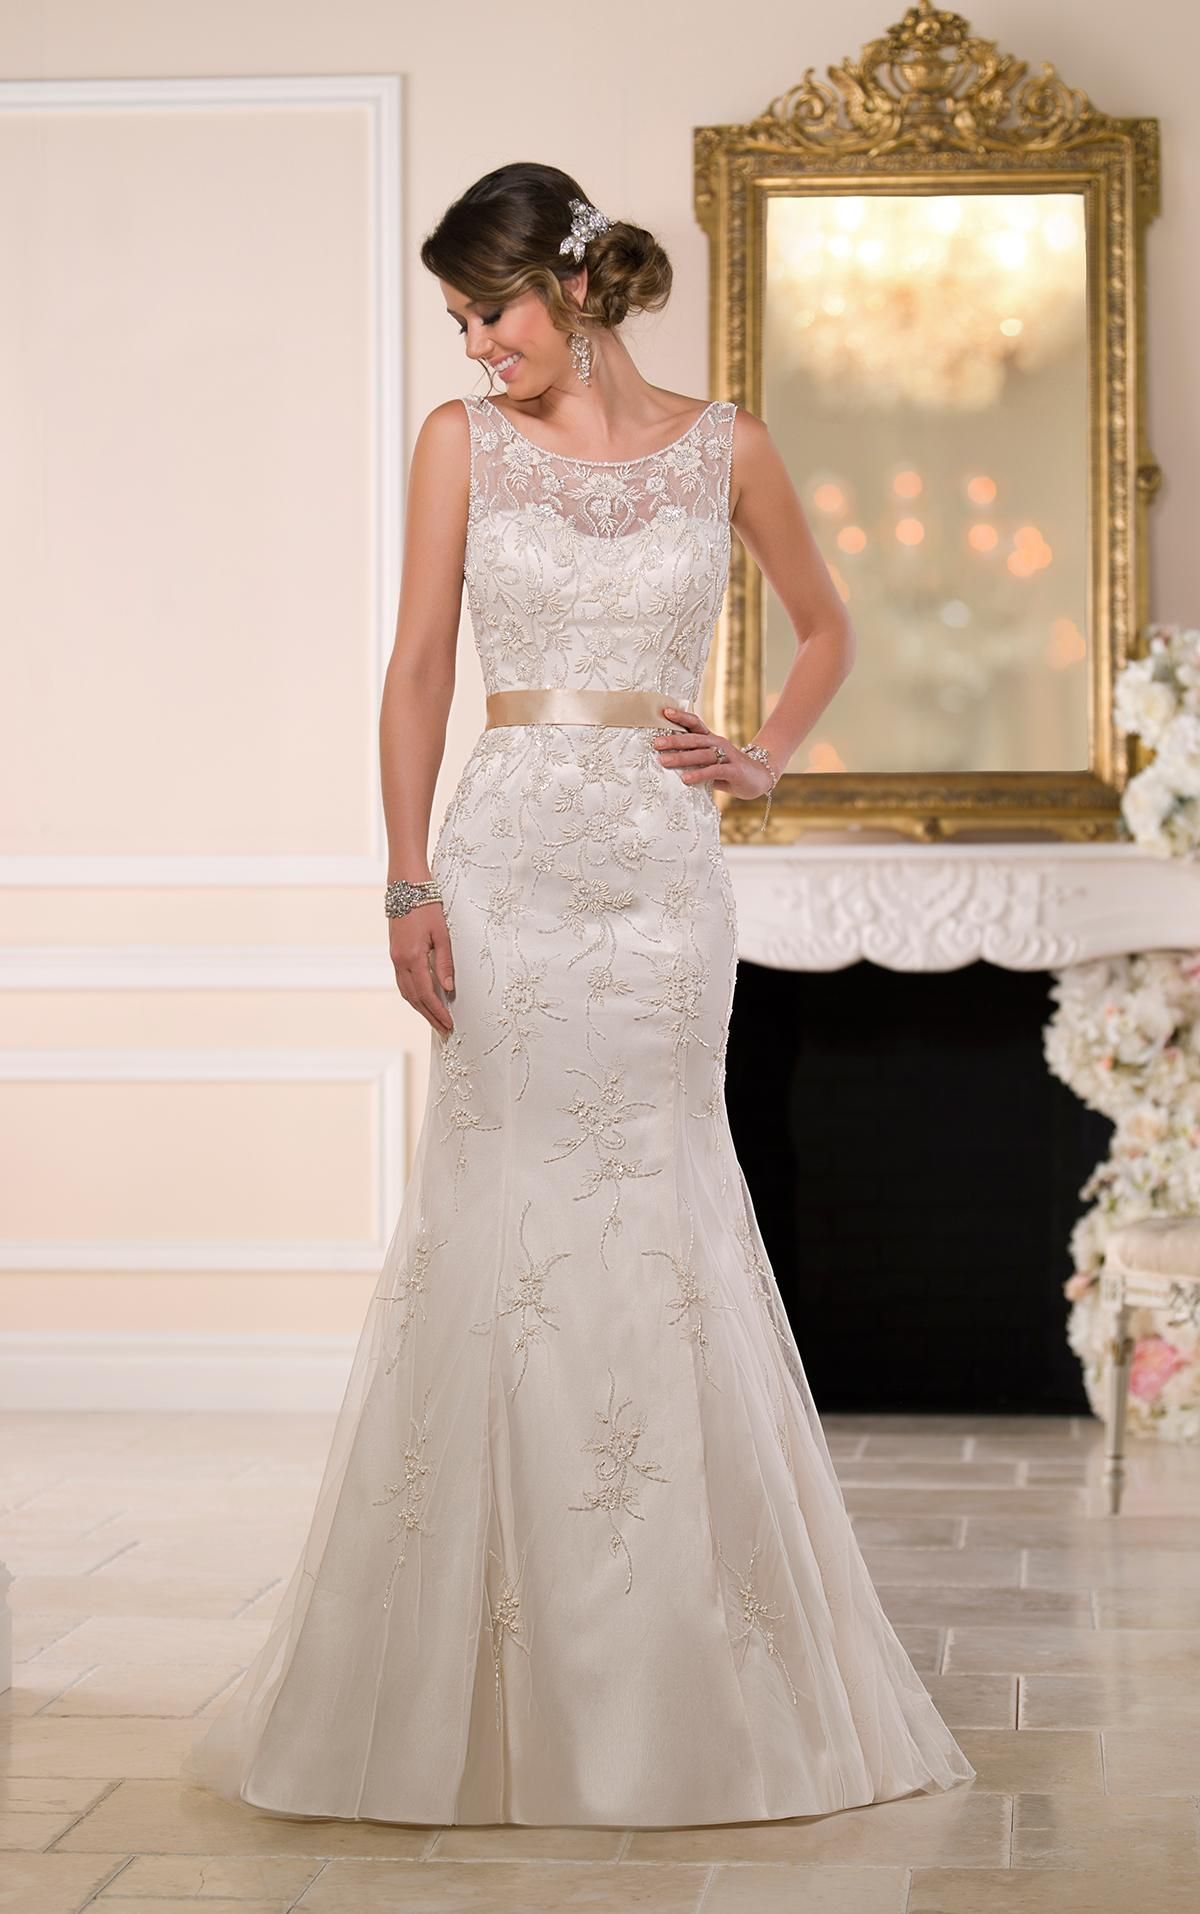 Wedding Dress For Petite Bride 2016 Romantic Wedding Dresses By ...